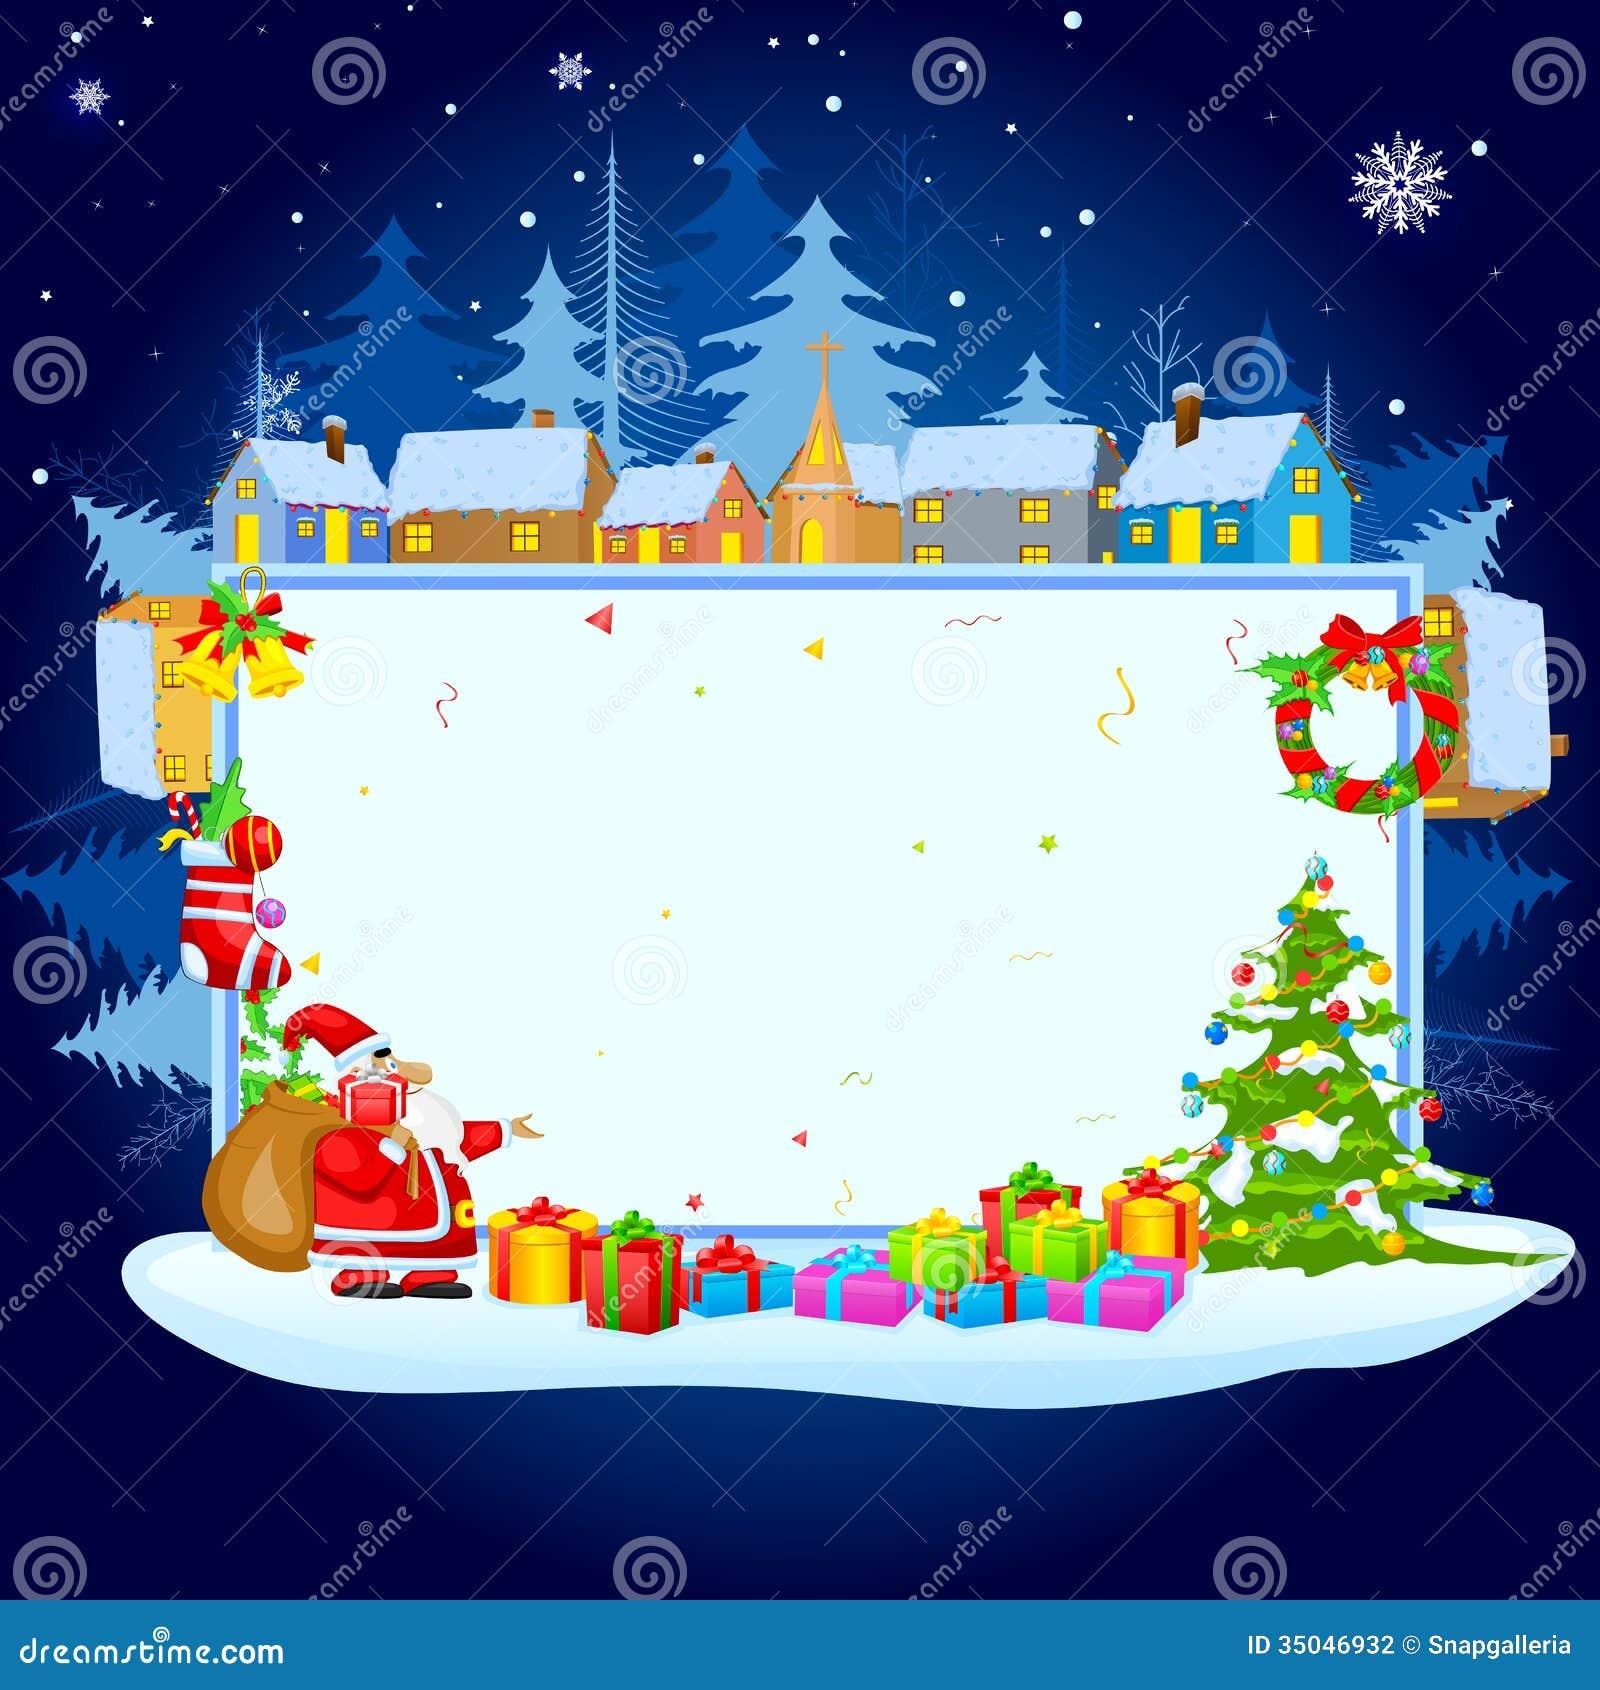 Santa Claus Wishing Merry Christmas Stock Photography - Image ...